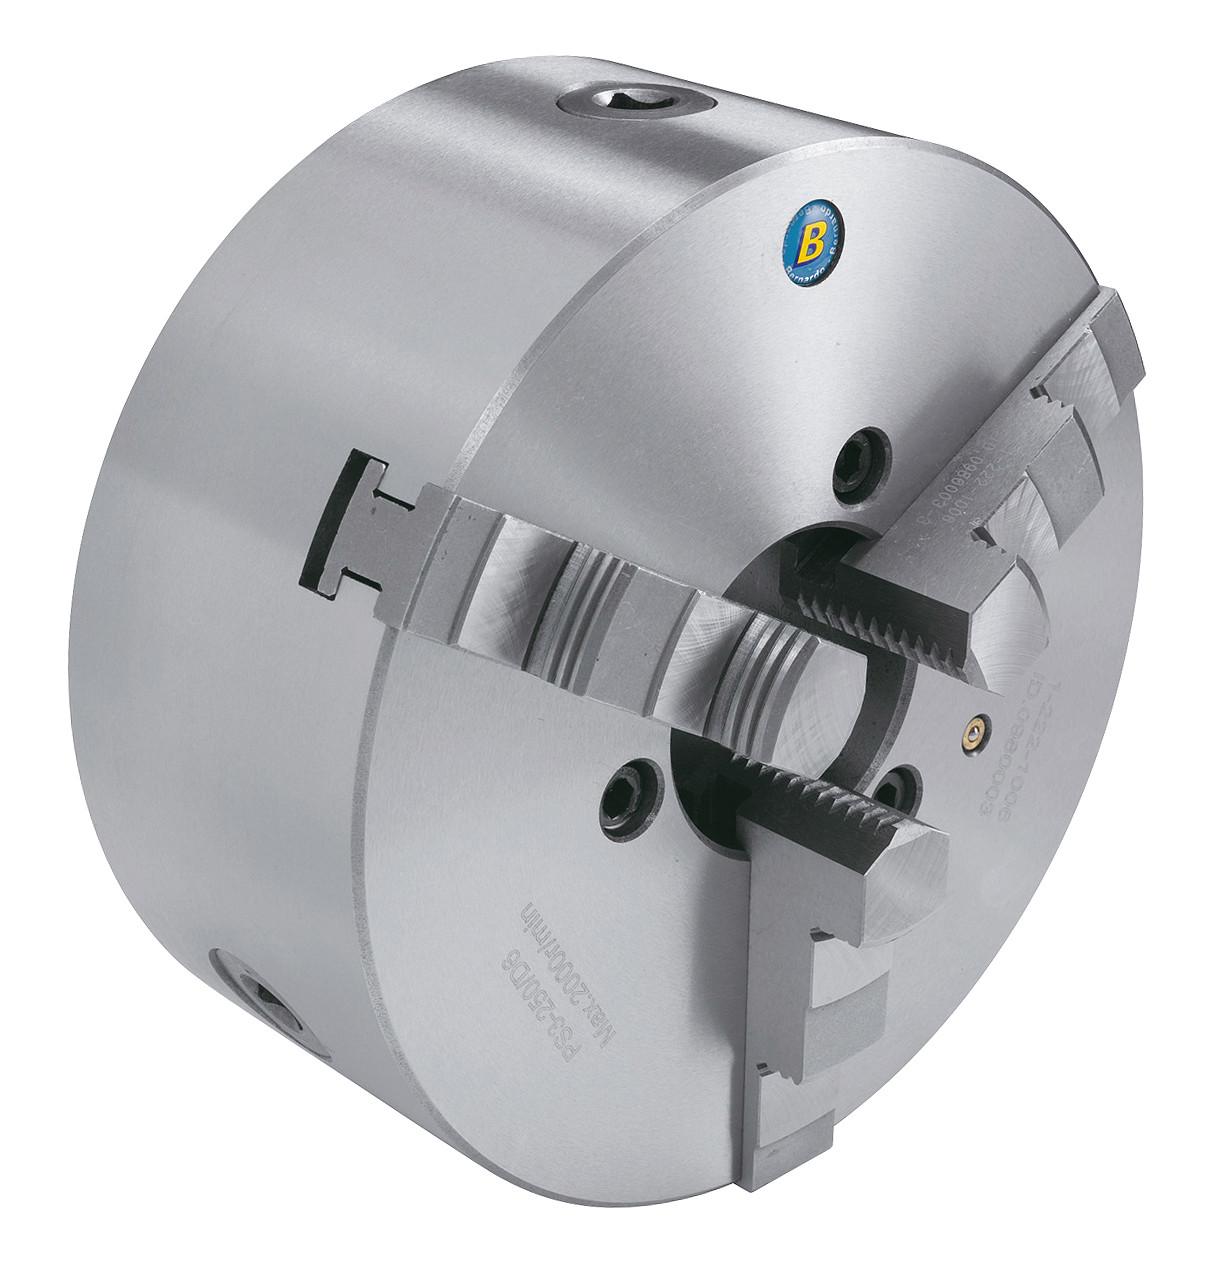 Стандартный 3-челюстный патрон PS3-500/D11